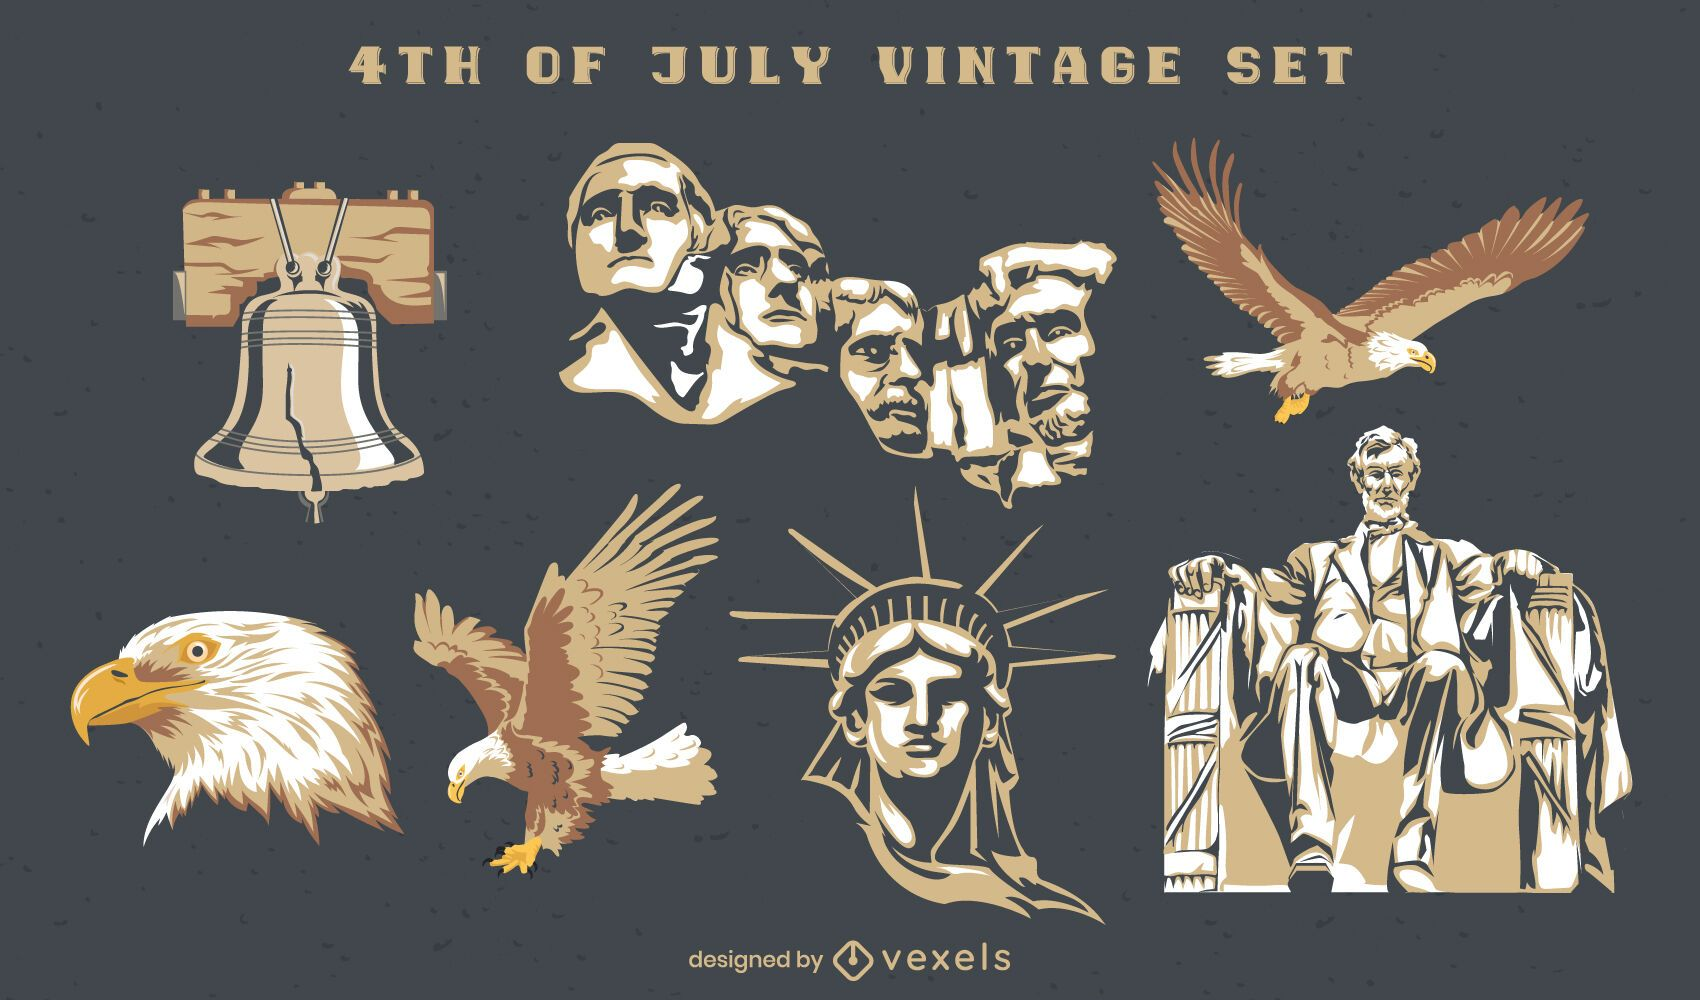 4th of July vintage semi flat set of elements